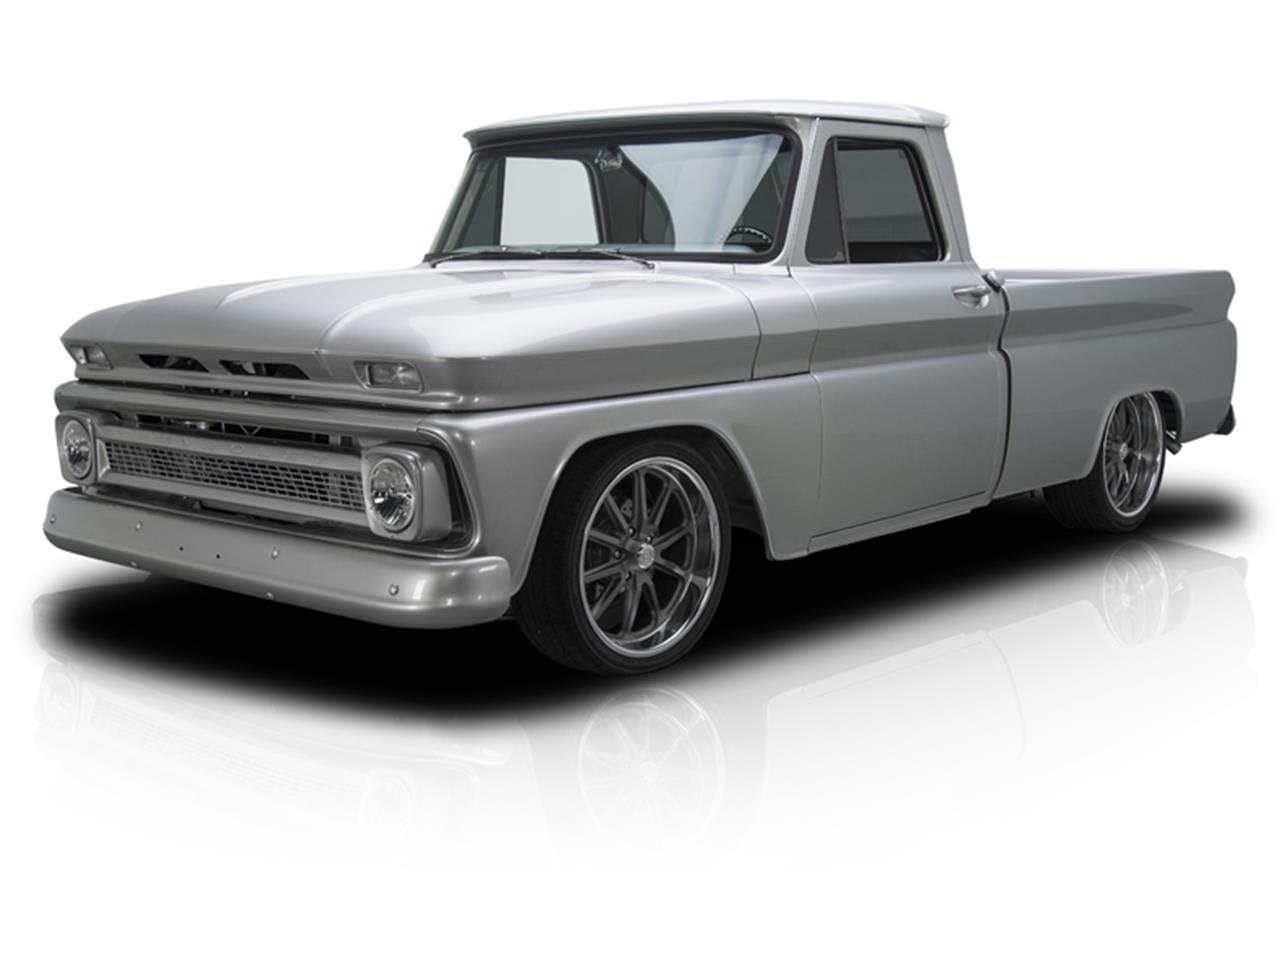 1965 chevrolet c10 apache pickup truck for sale cc 914673. Black Bedroom Furniture Sets. Home Design Ideas